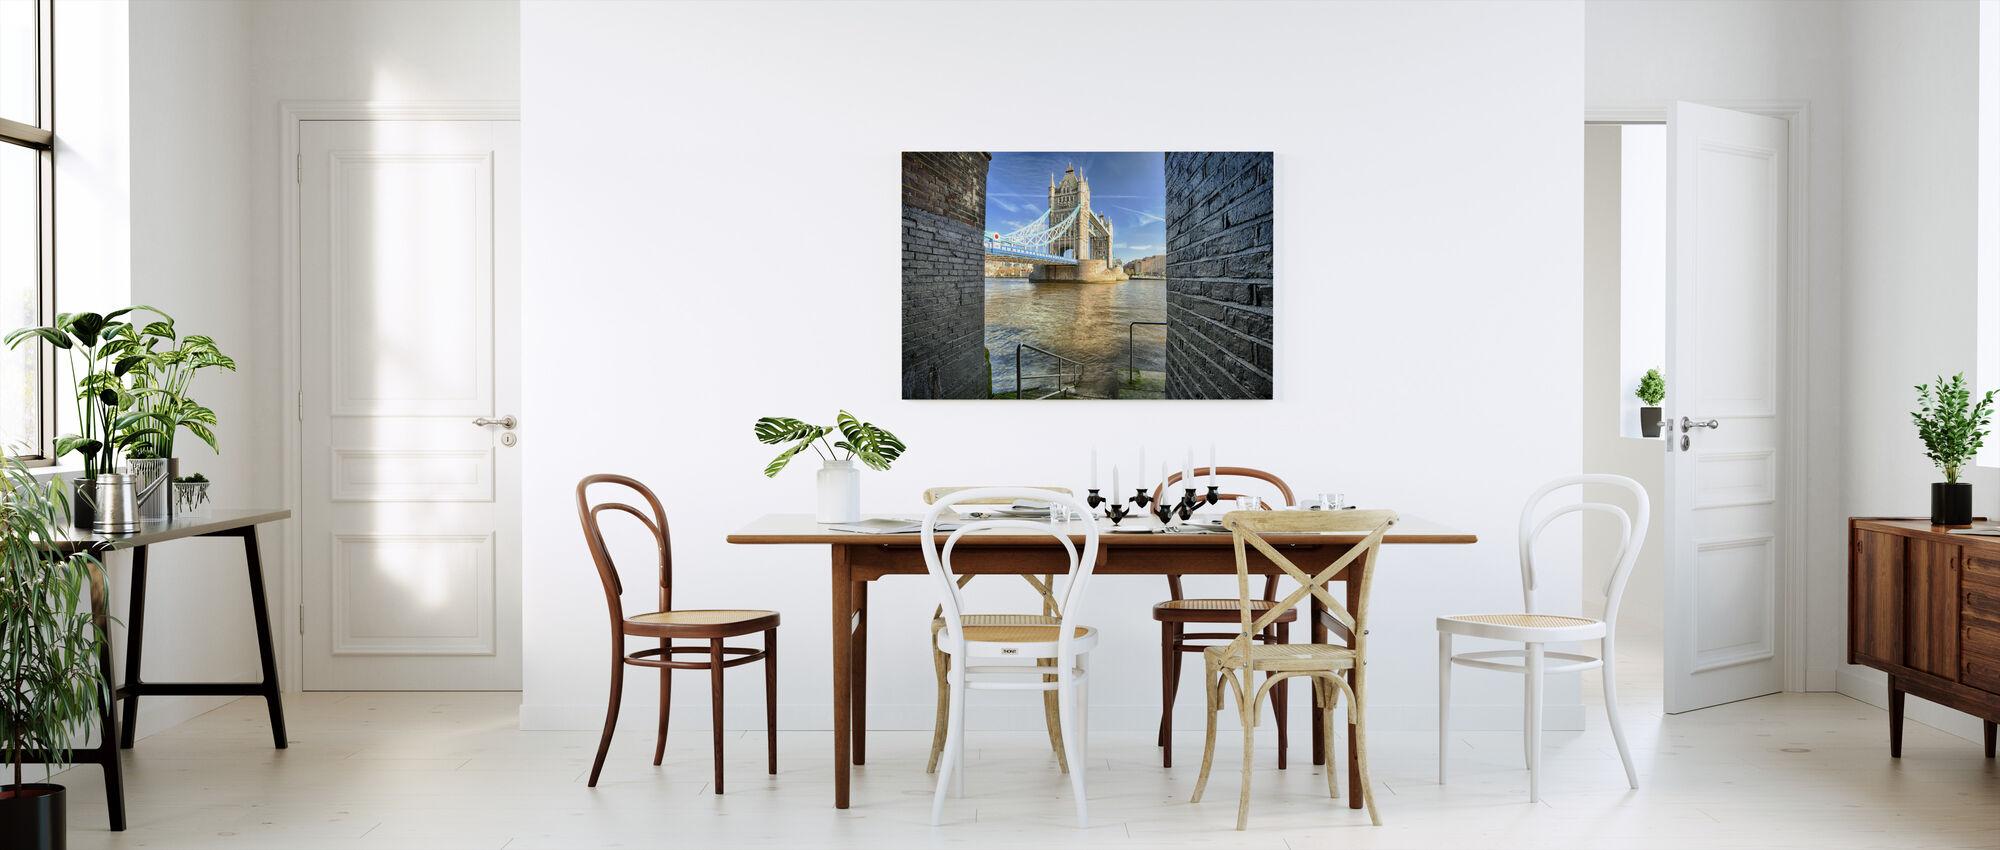 Alternativ visning på tårnbroen - Lerretsbilde - Kjøkken